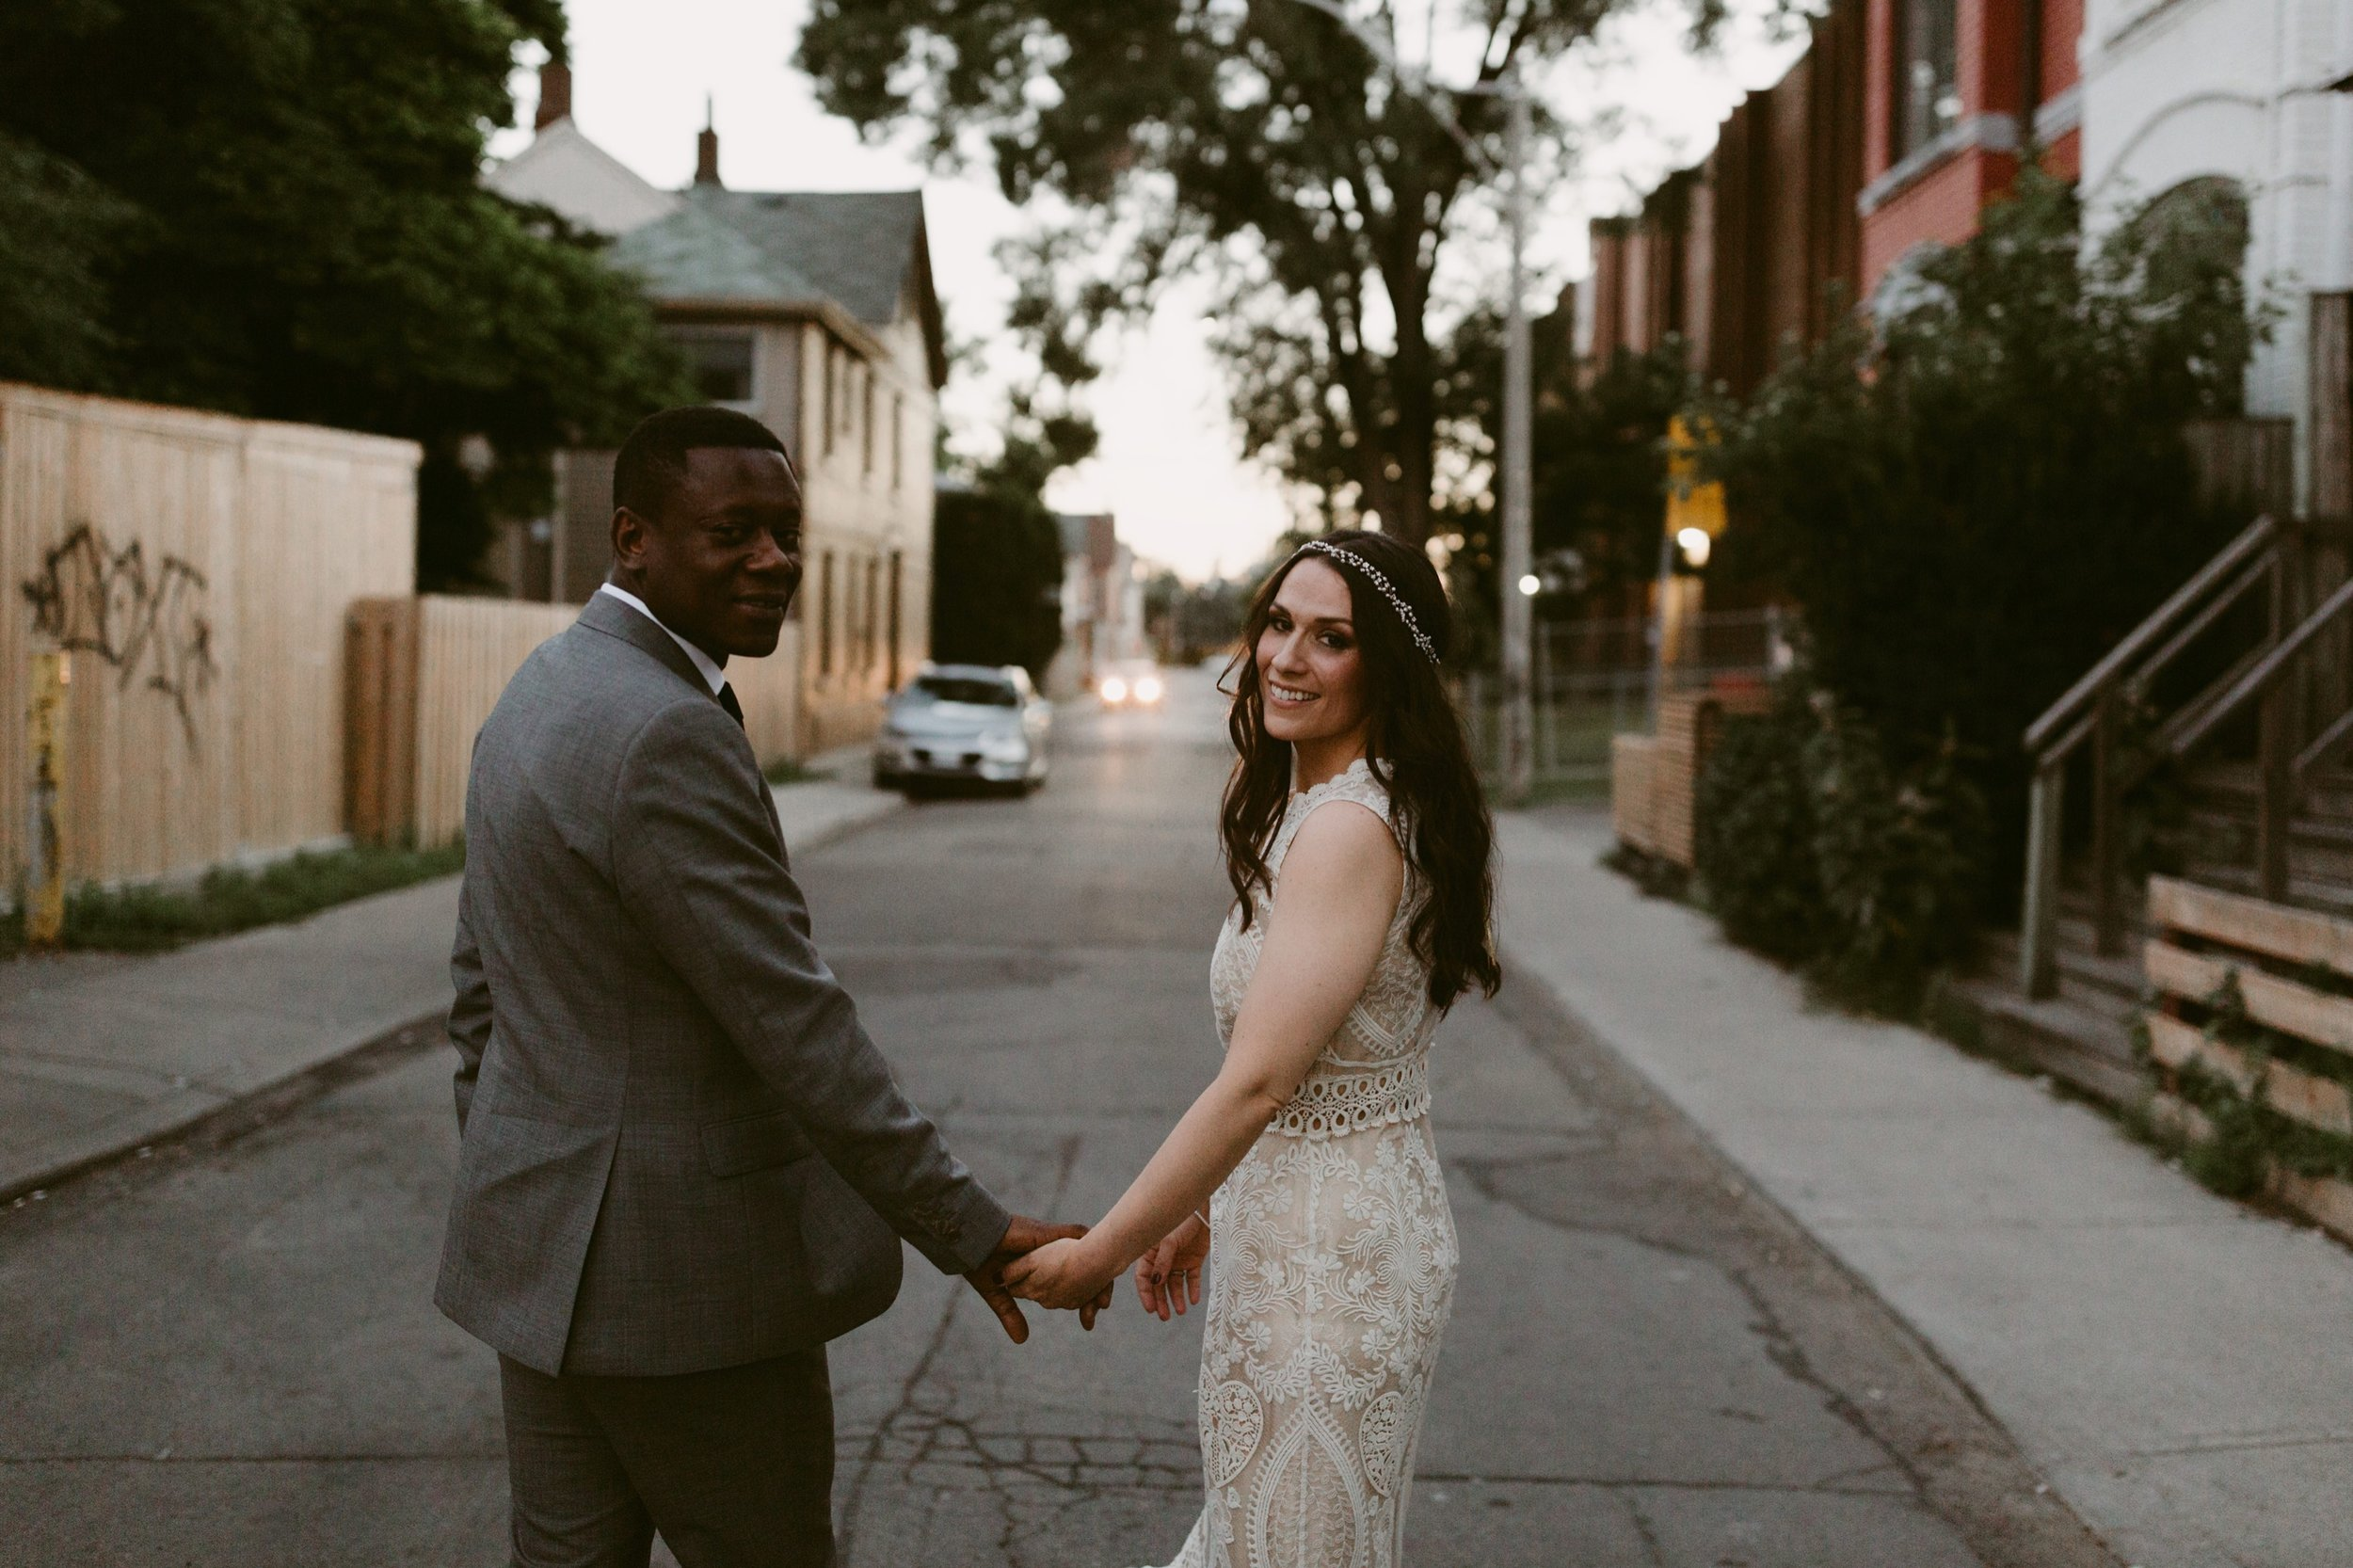 098_Spadina House Wedding (502 of 748)_intimate_Boehmer_Restaurant_Toronto_Wedding.jpg